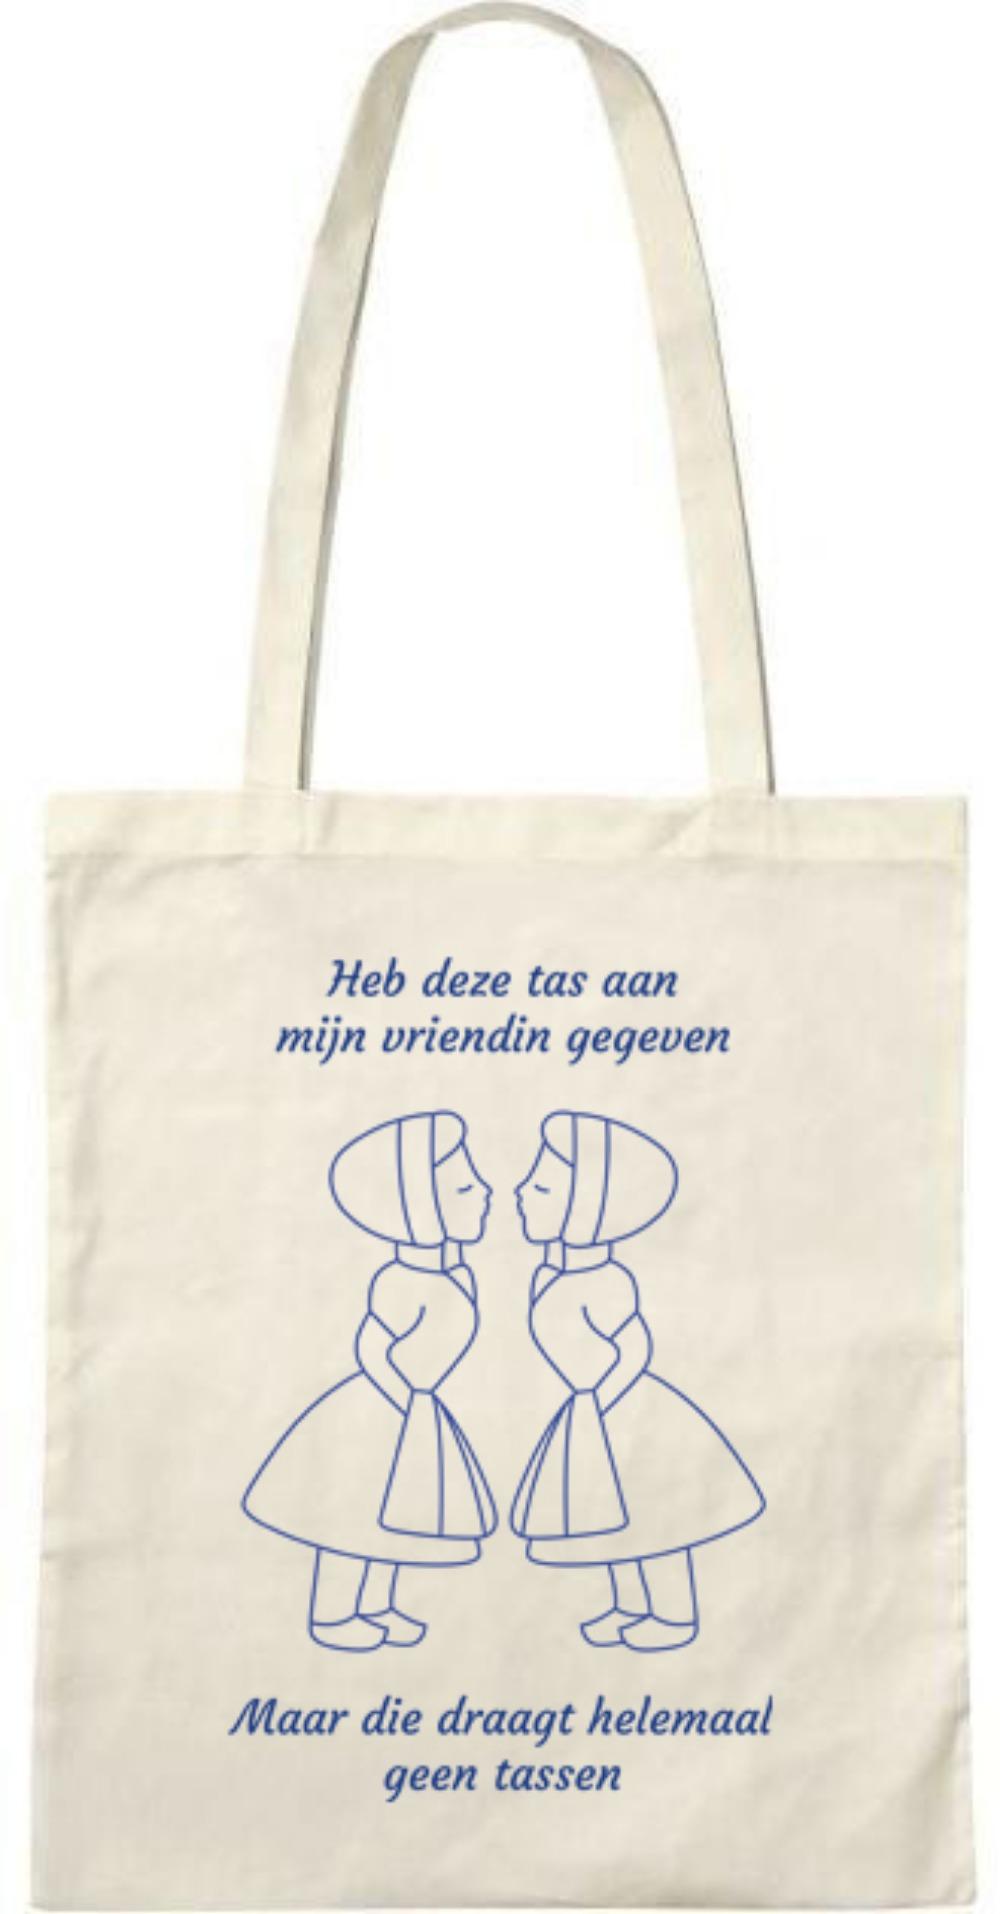 Heb deze tas aan  (vrouwtje-vrouwtje) - Tasje